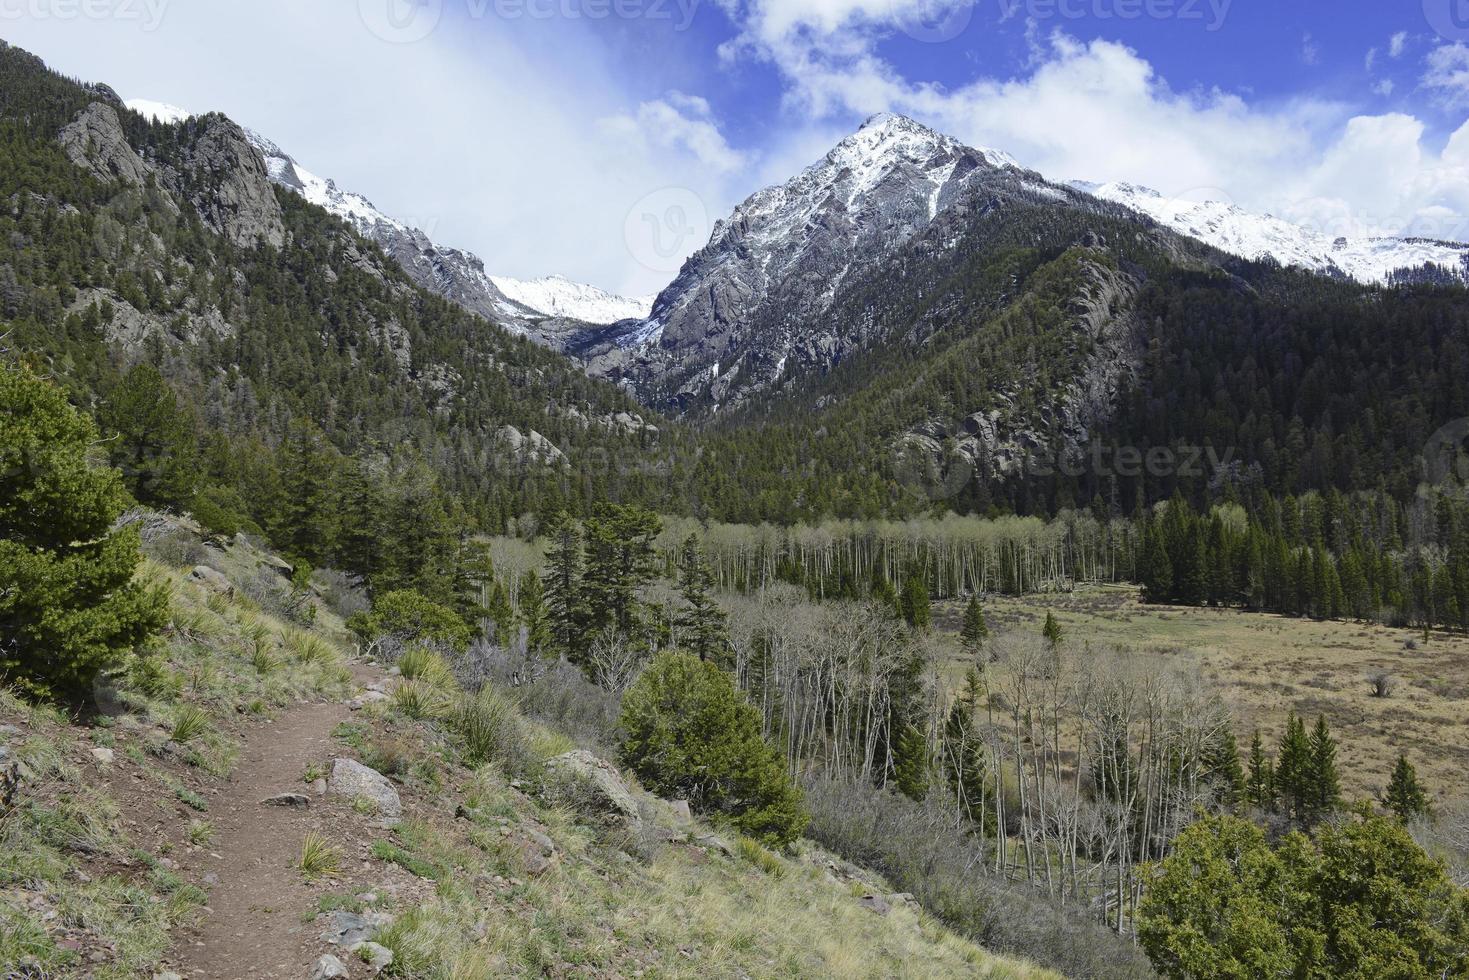 alpine landschap, sangre de cristo range, rotsachtige bergen in colorado foto